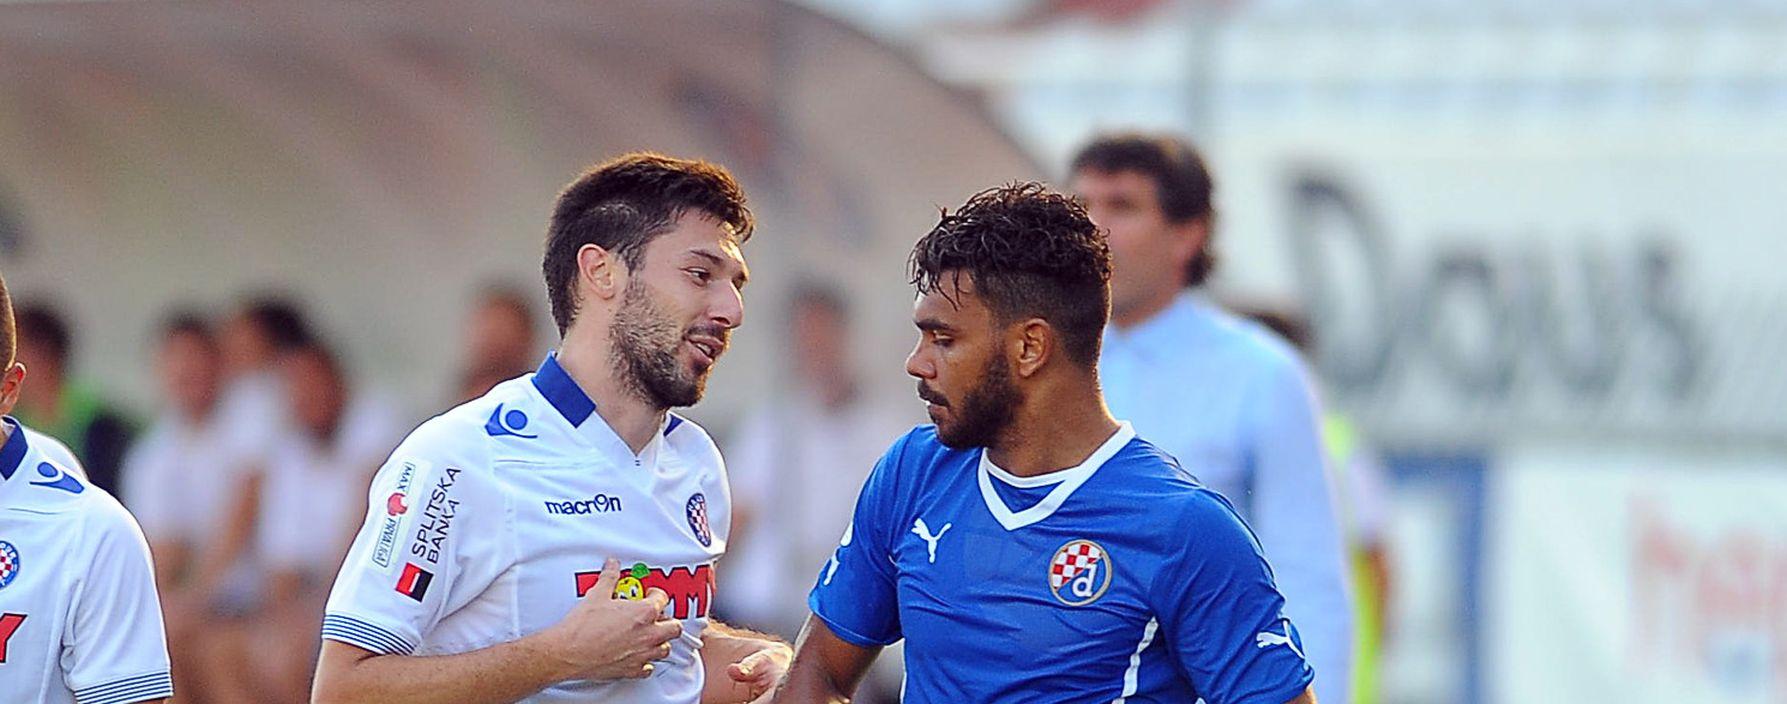 DOMAĆIN (OŠTEĆEN?) BLIŽE TRIJUMFU Derbi: Hajduk – Dinamo 0:0